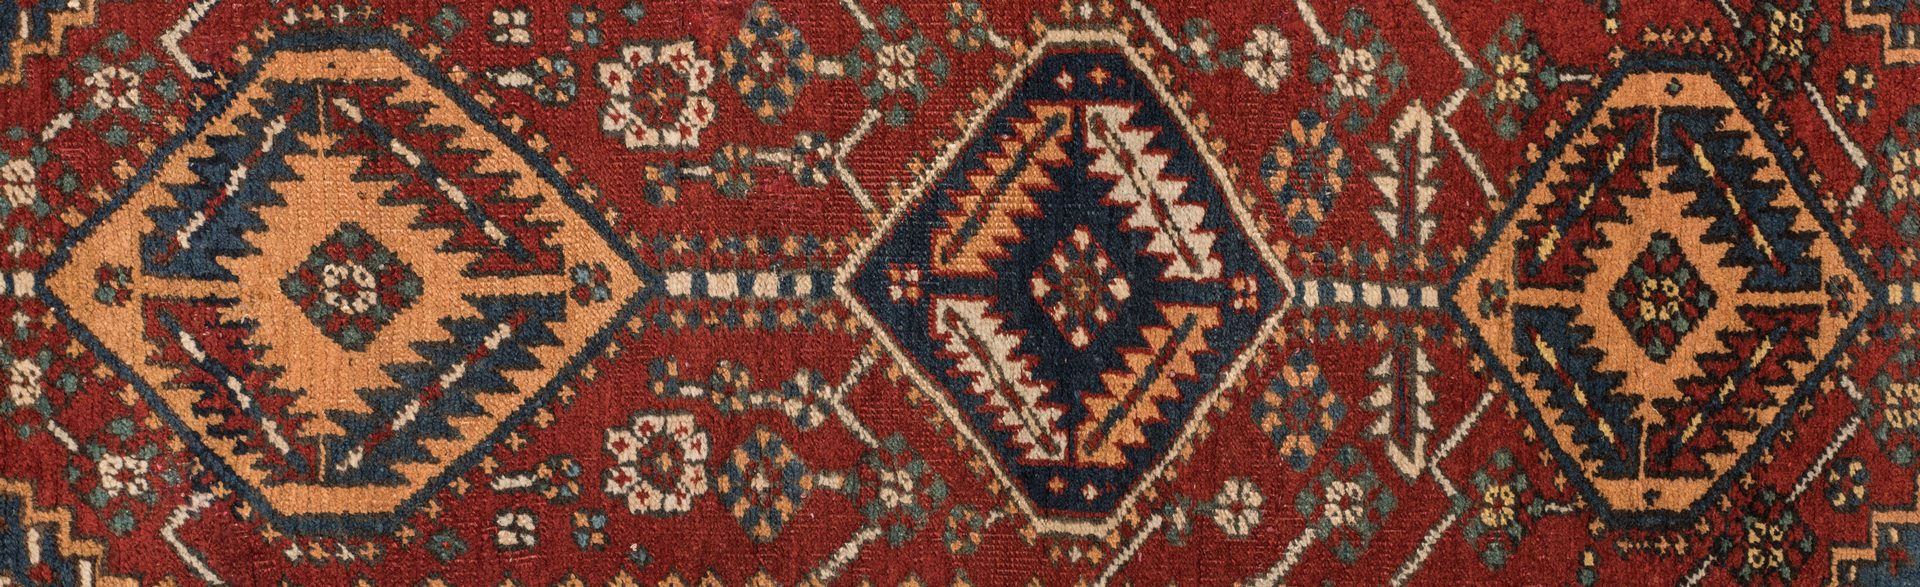 Lot 863: Antique Persian Heriz Area Rug